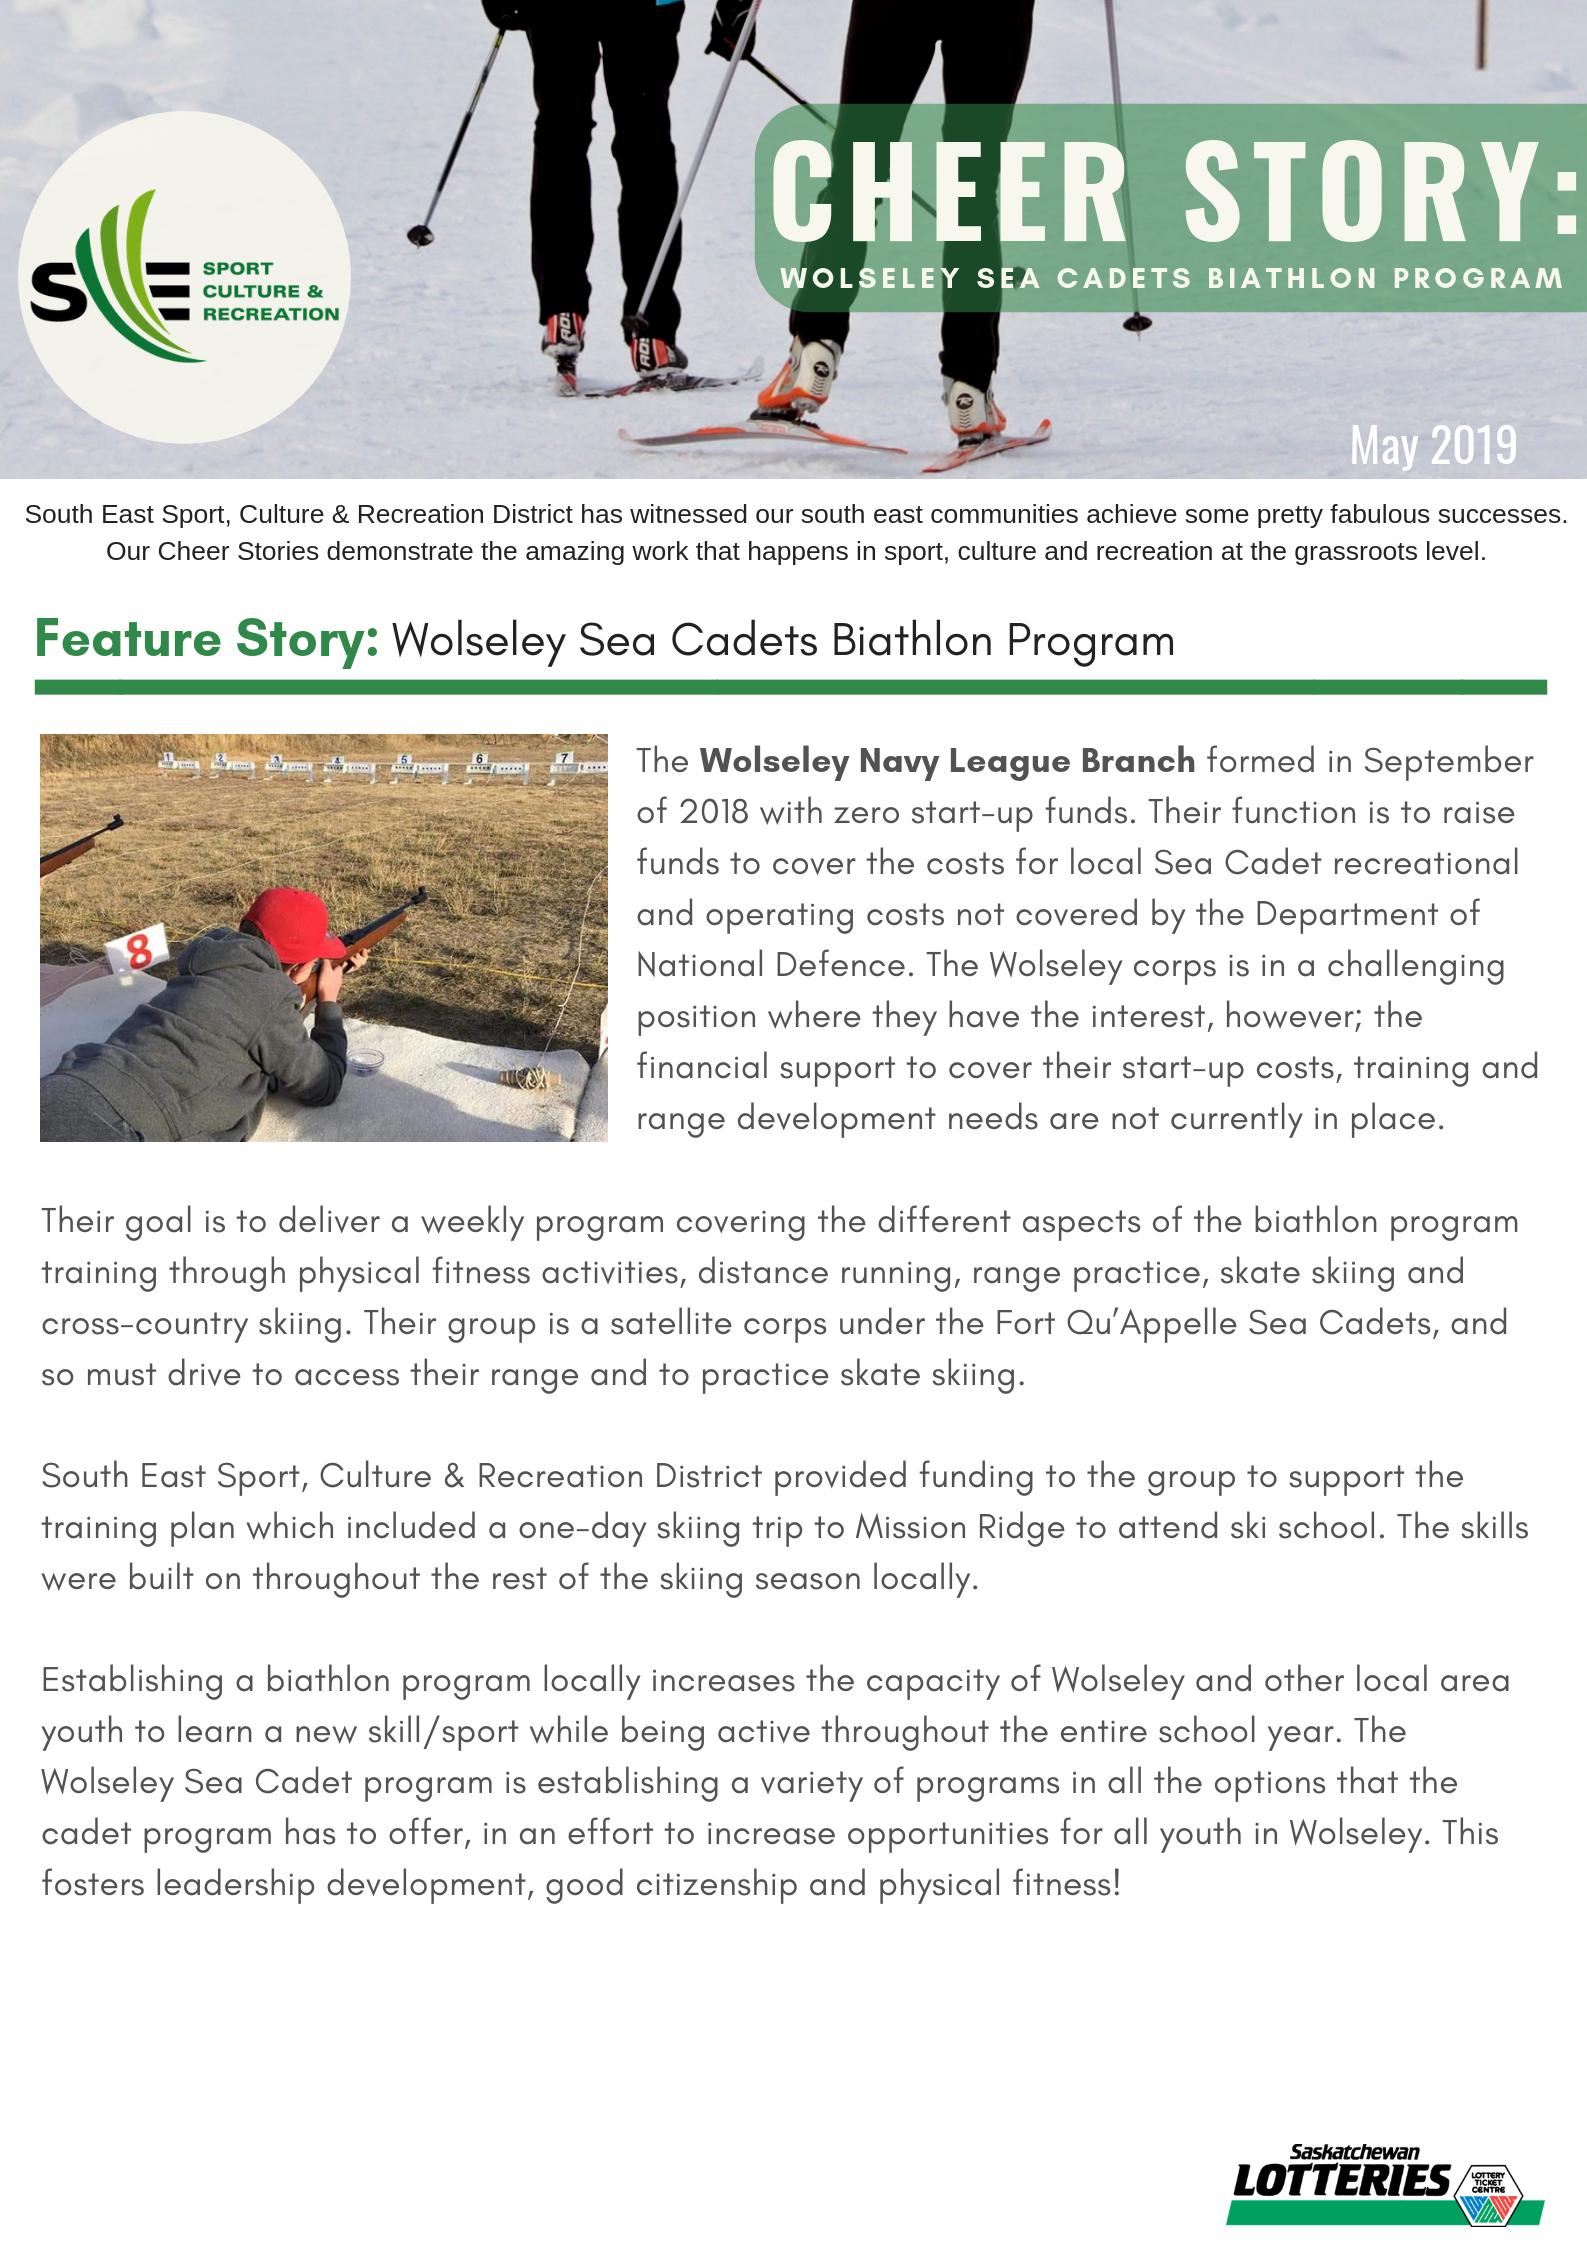 Cheer Story: Wolseley Sea Cadets Biathlon Program - Image 1